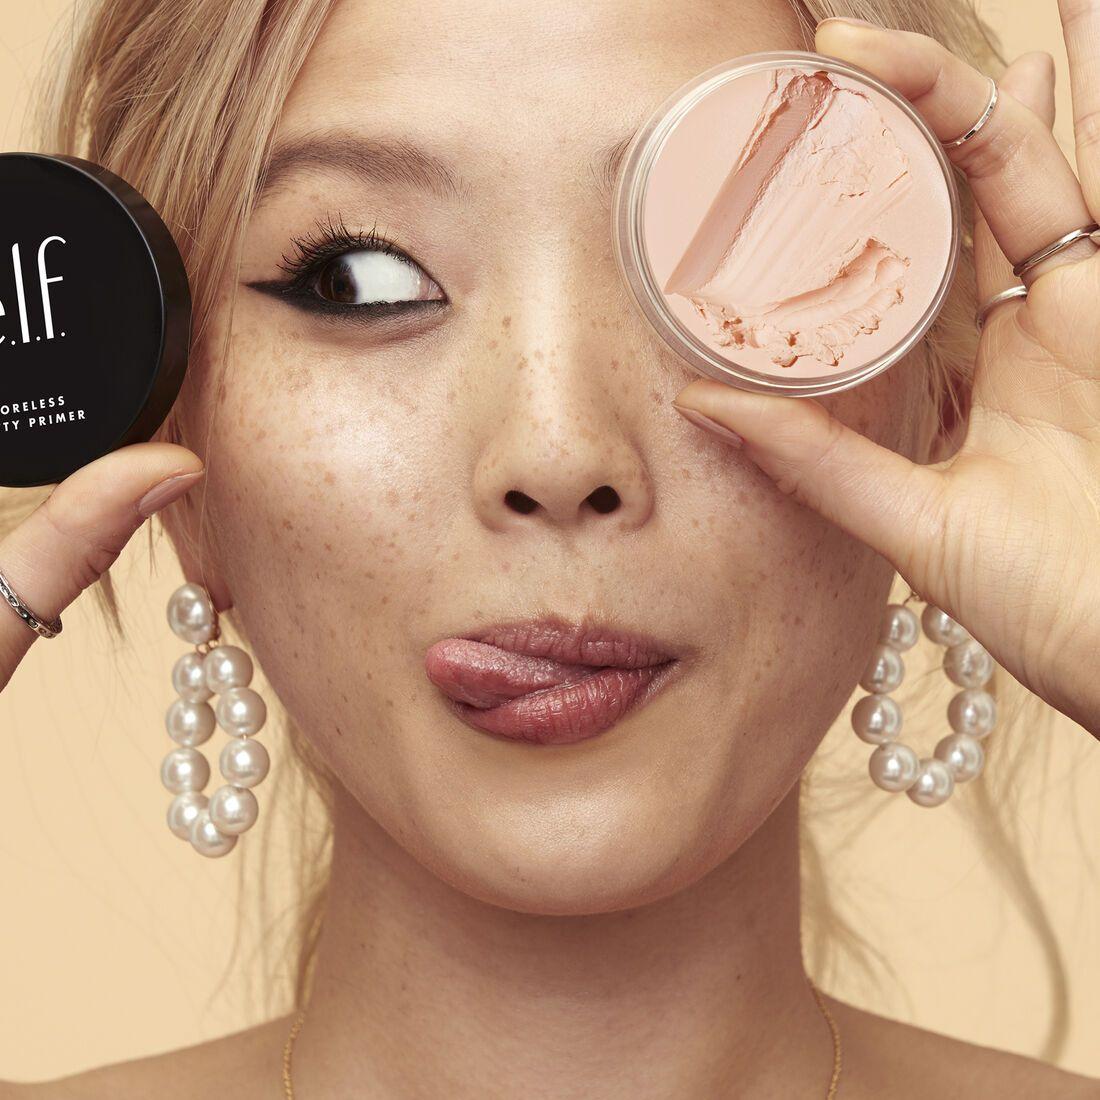 elf Poreless Putty Primer in 2020 Cruelty free cosmetics